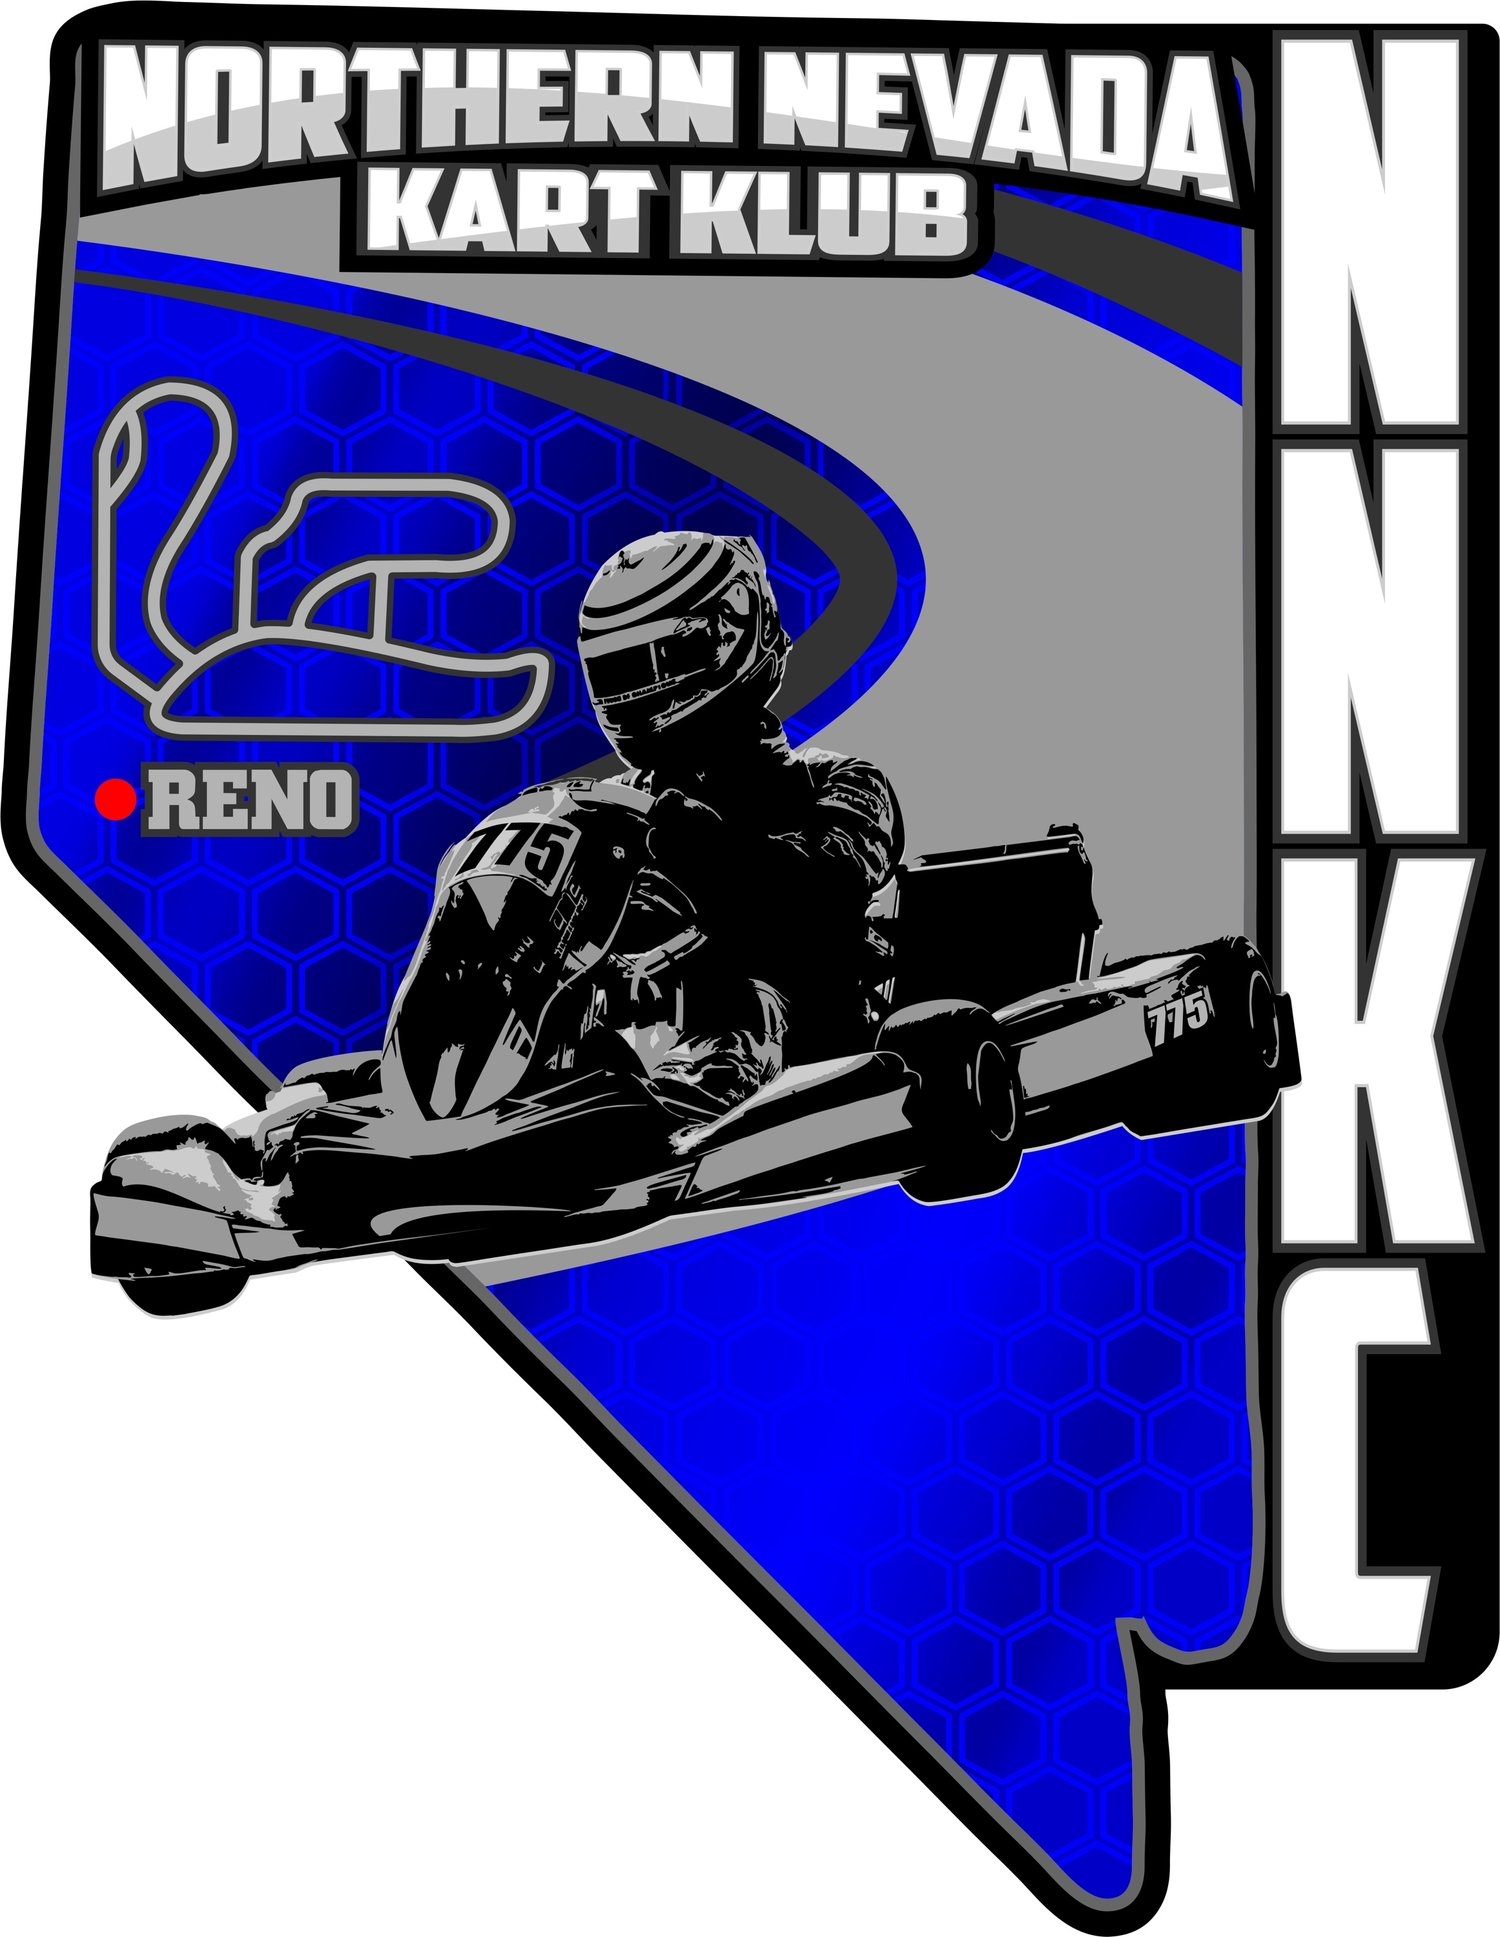 Go Karts Reno >> Nothern Nevada Kart Club